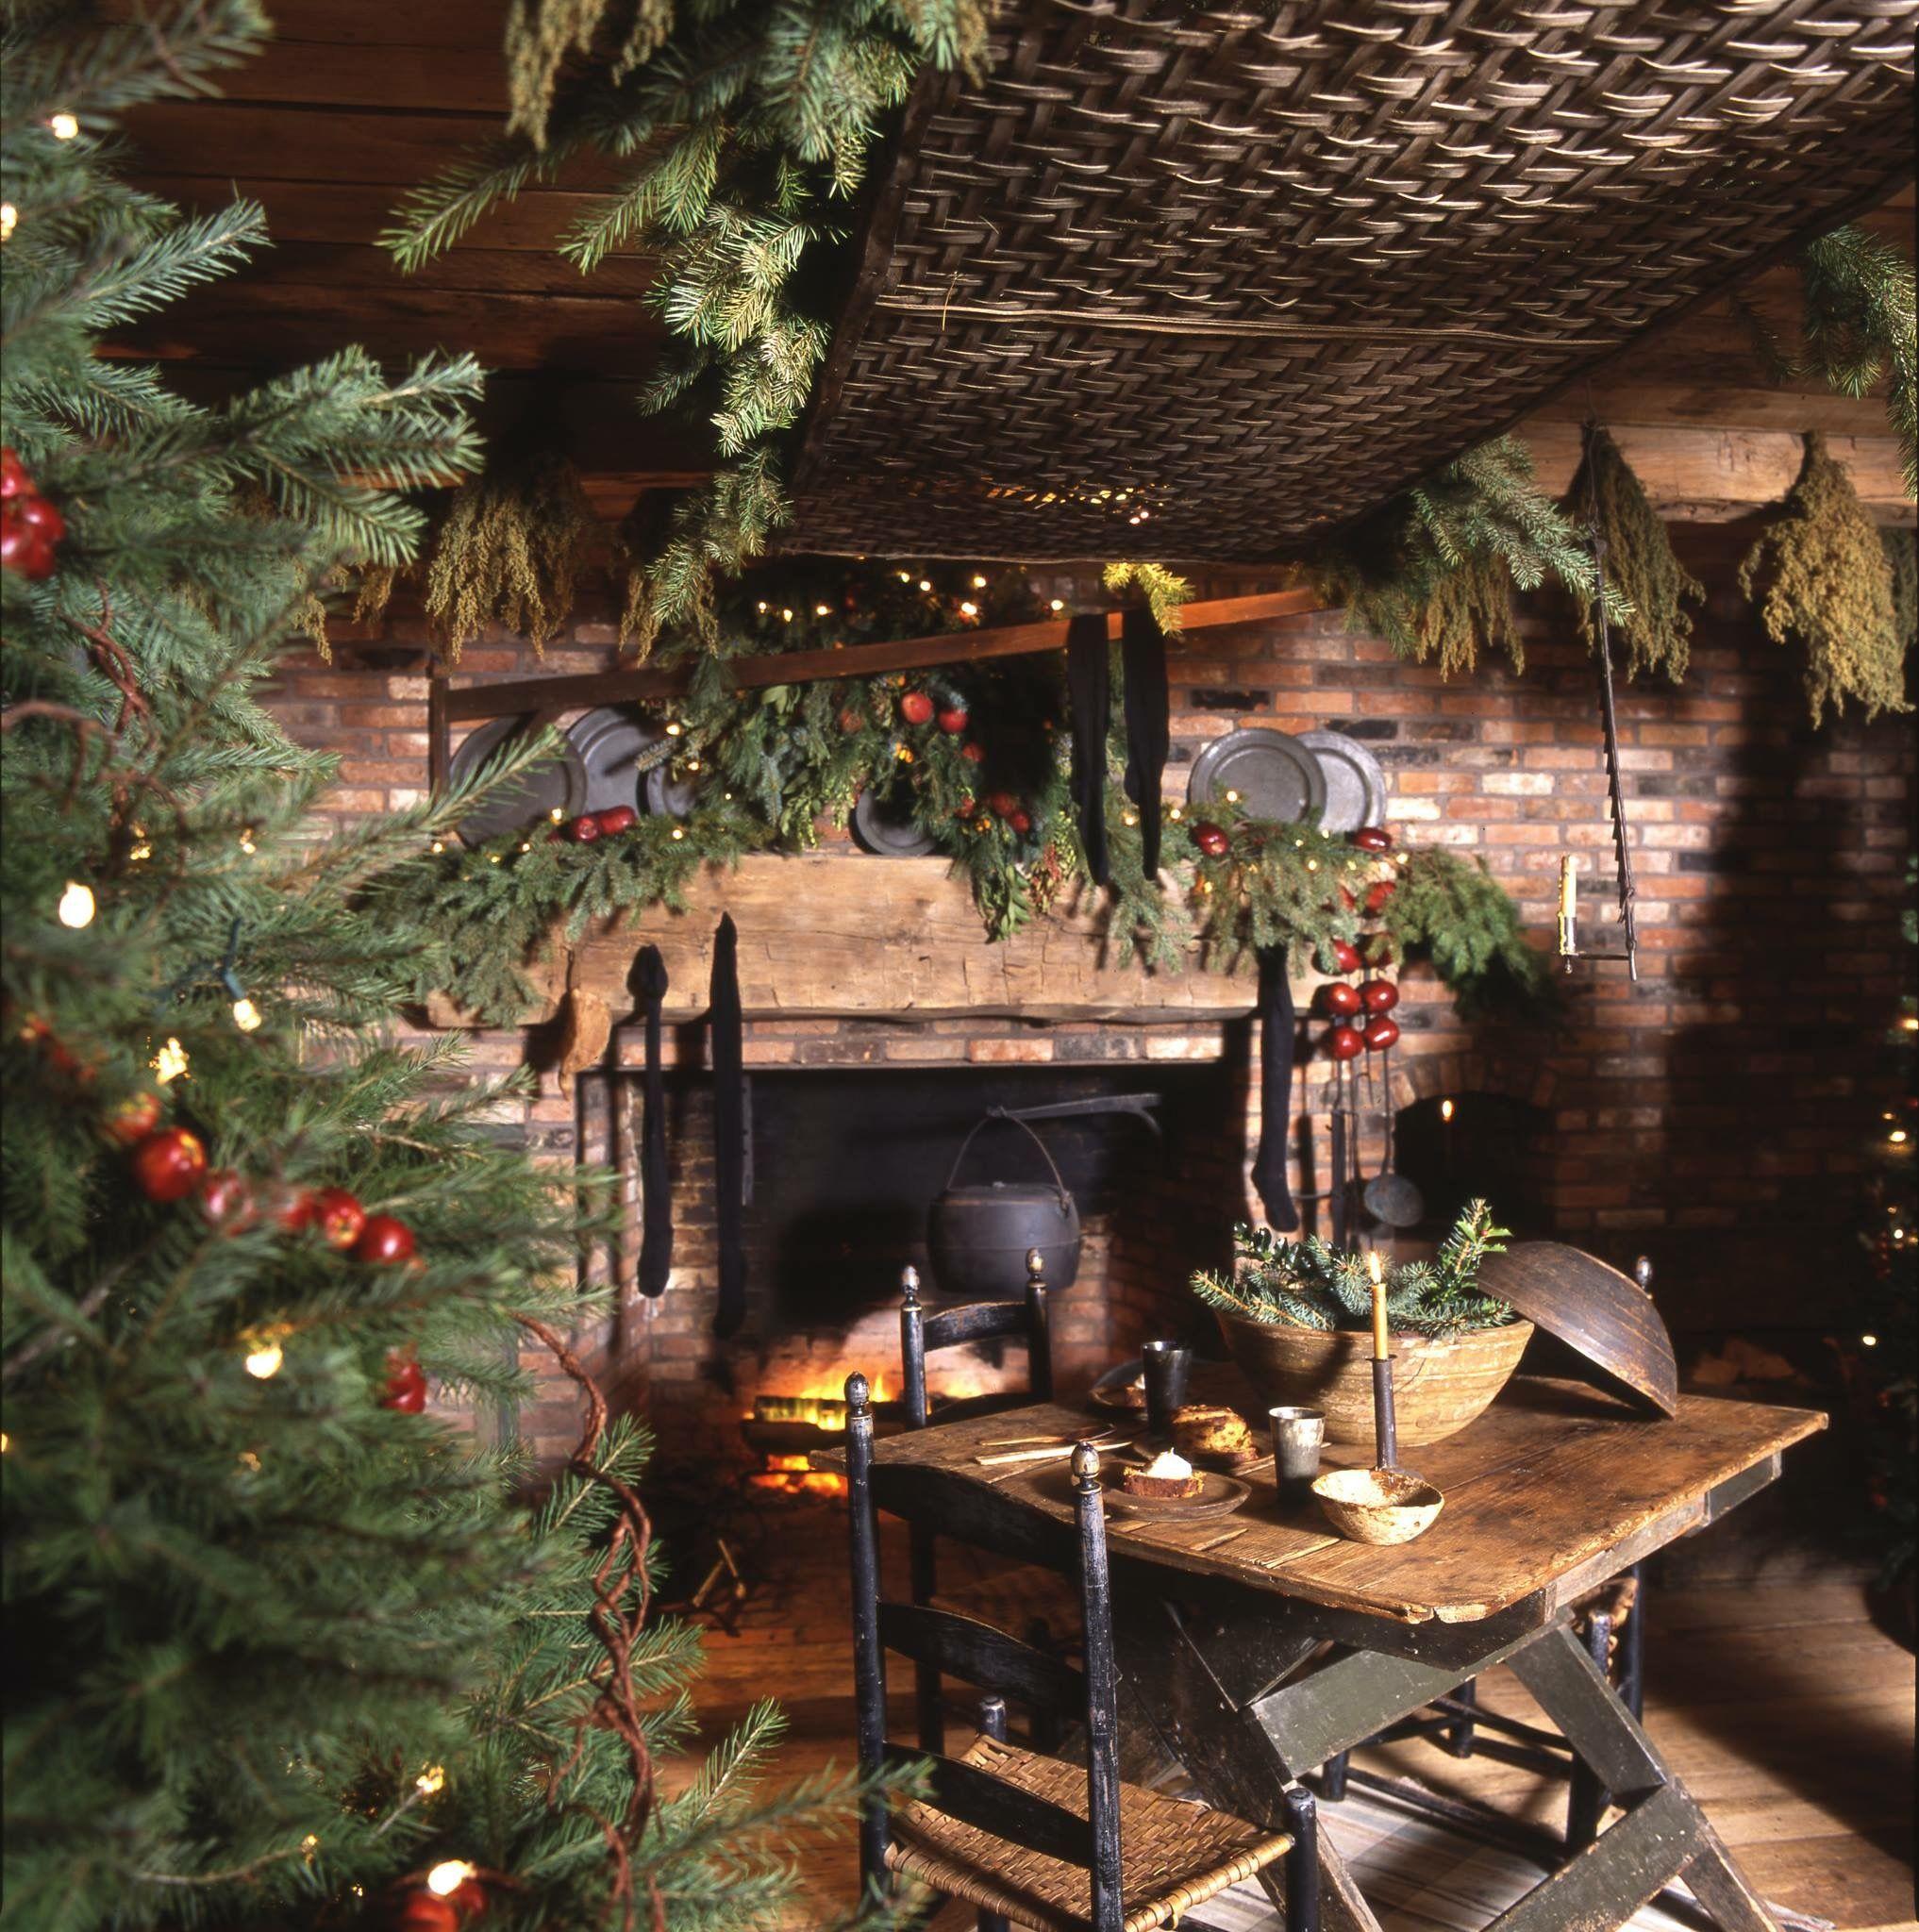 White Christmas, Vintage Christmas, Christmas Decorations, Xmas, Noel